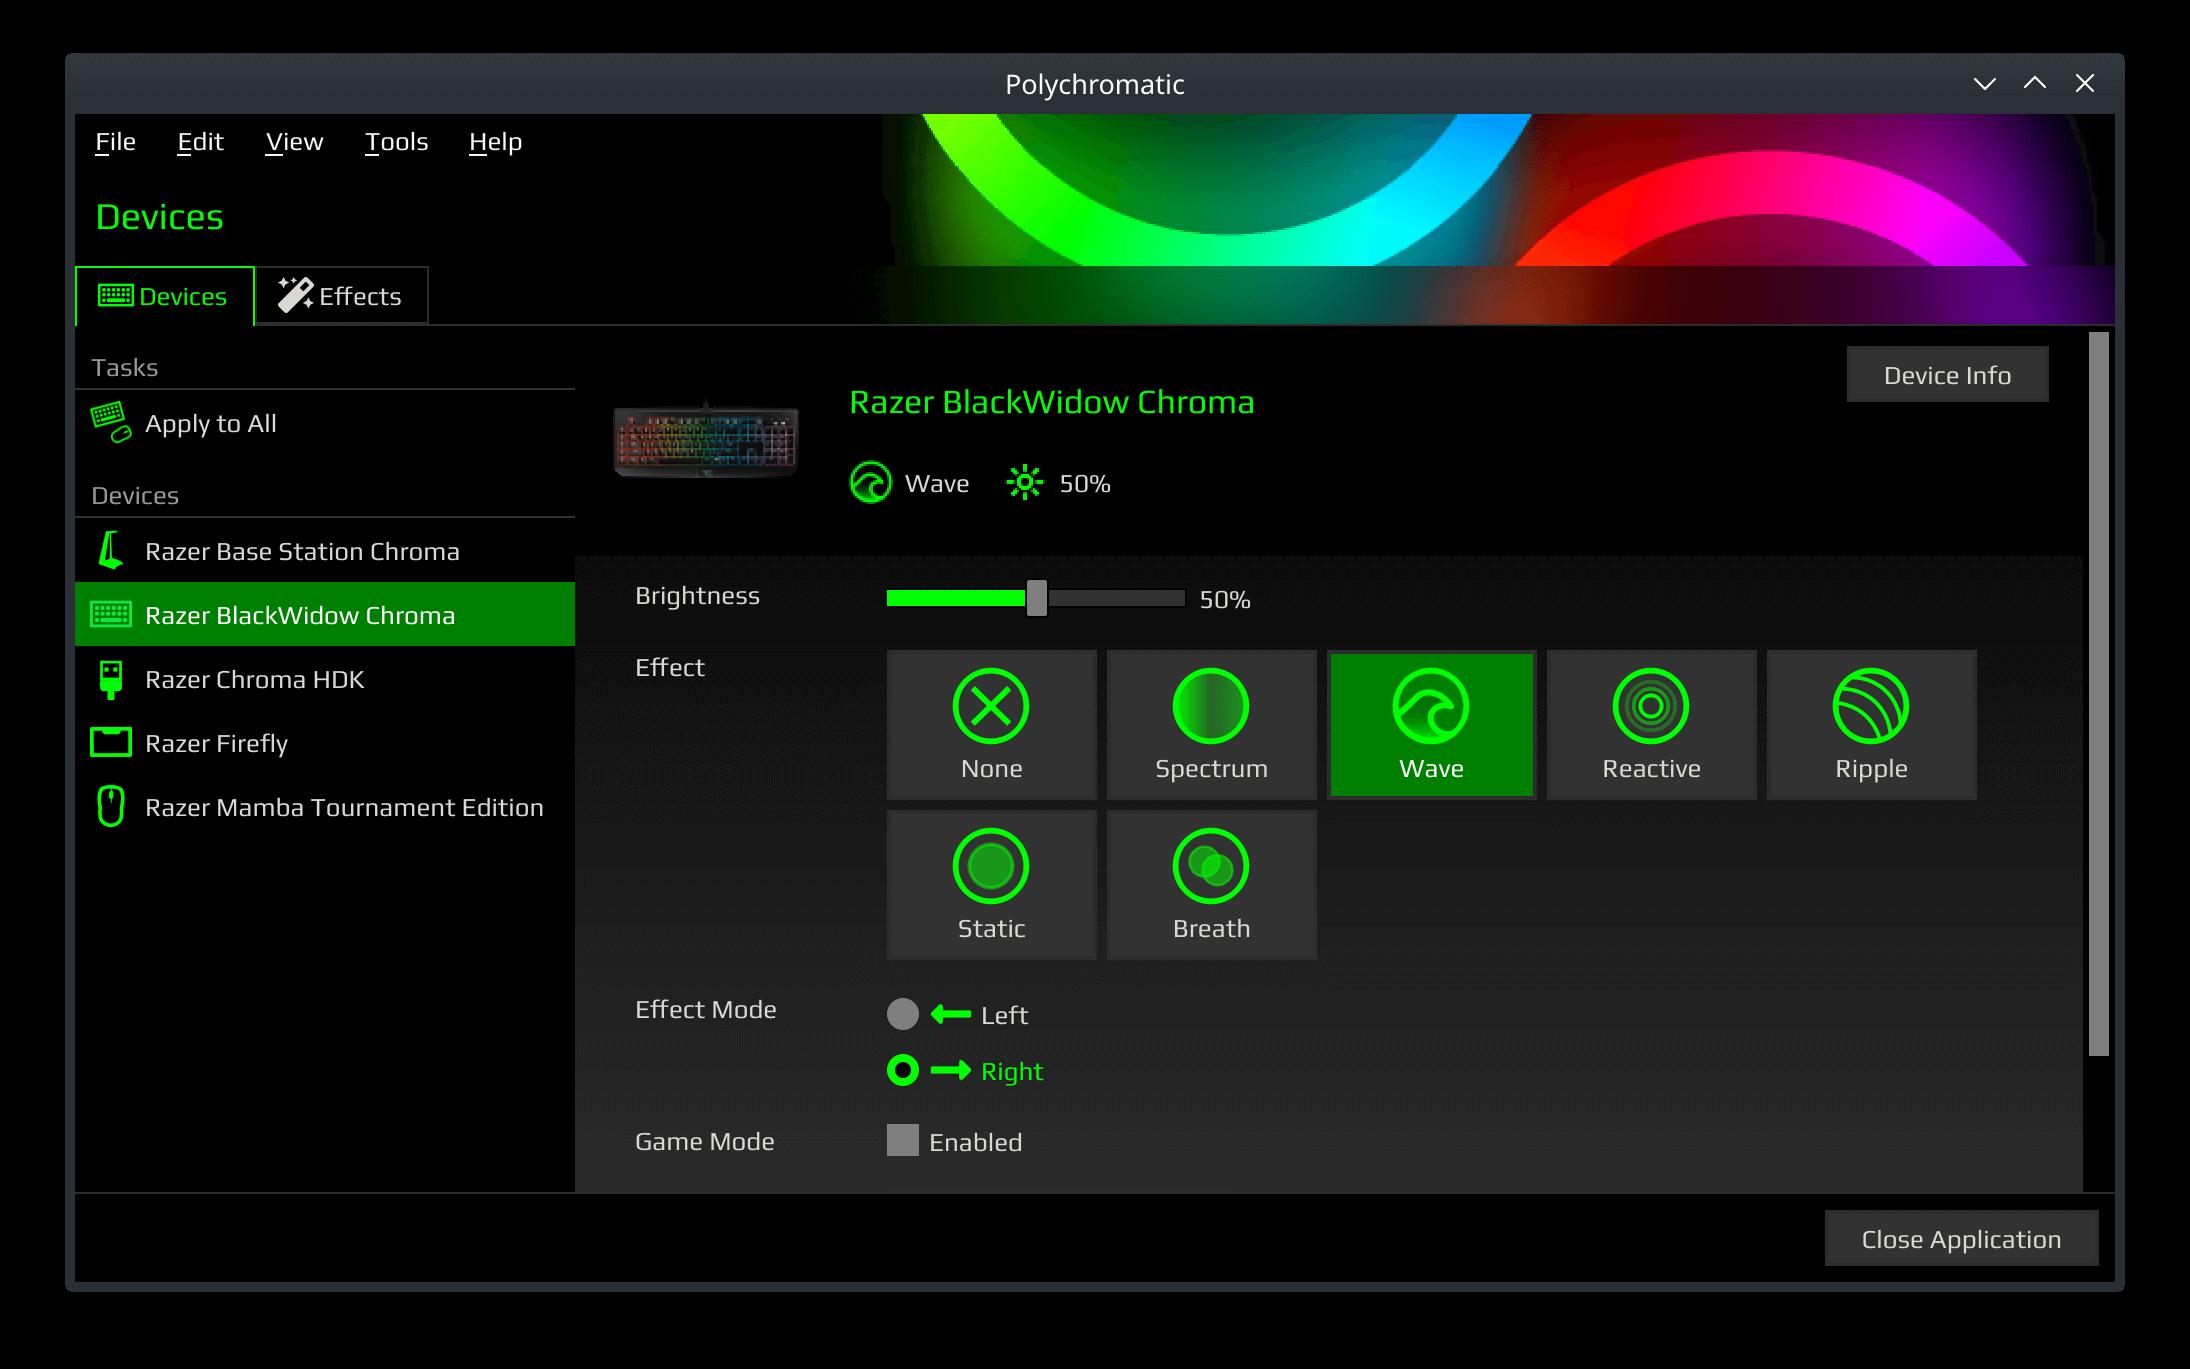 4K screenshot of Polychromatic's controller interface